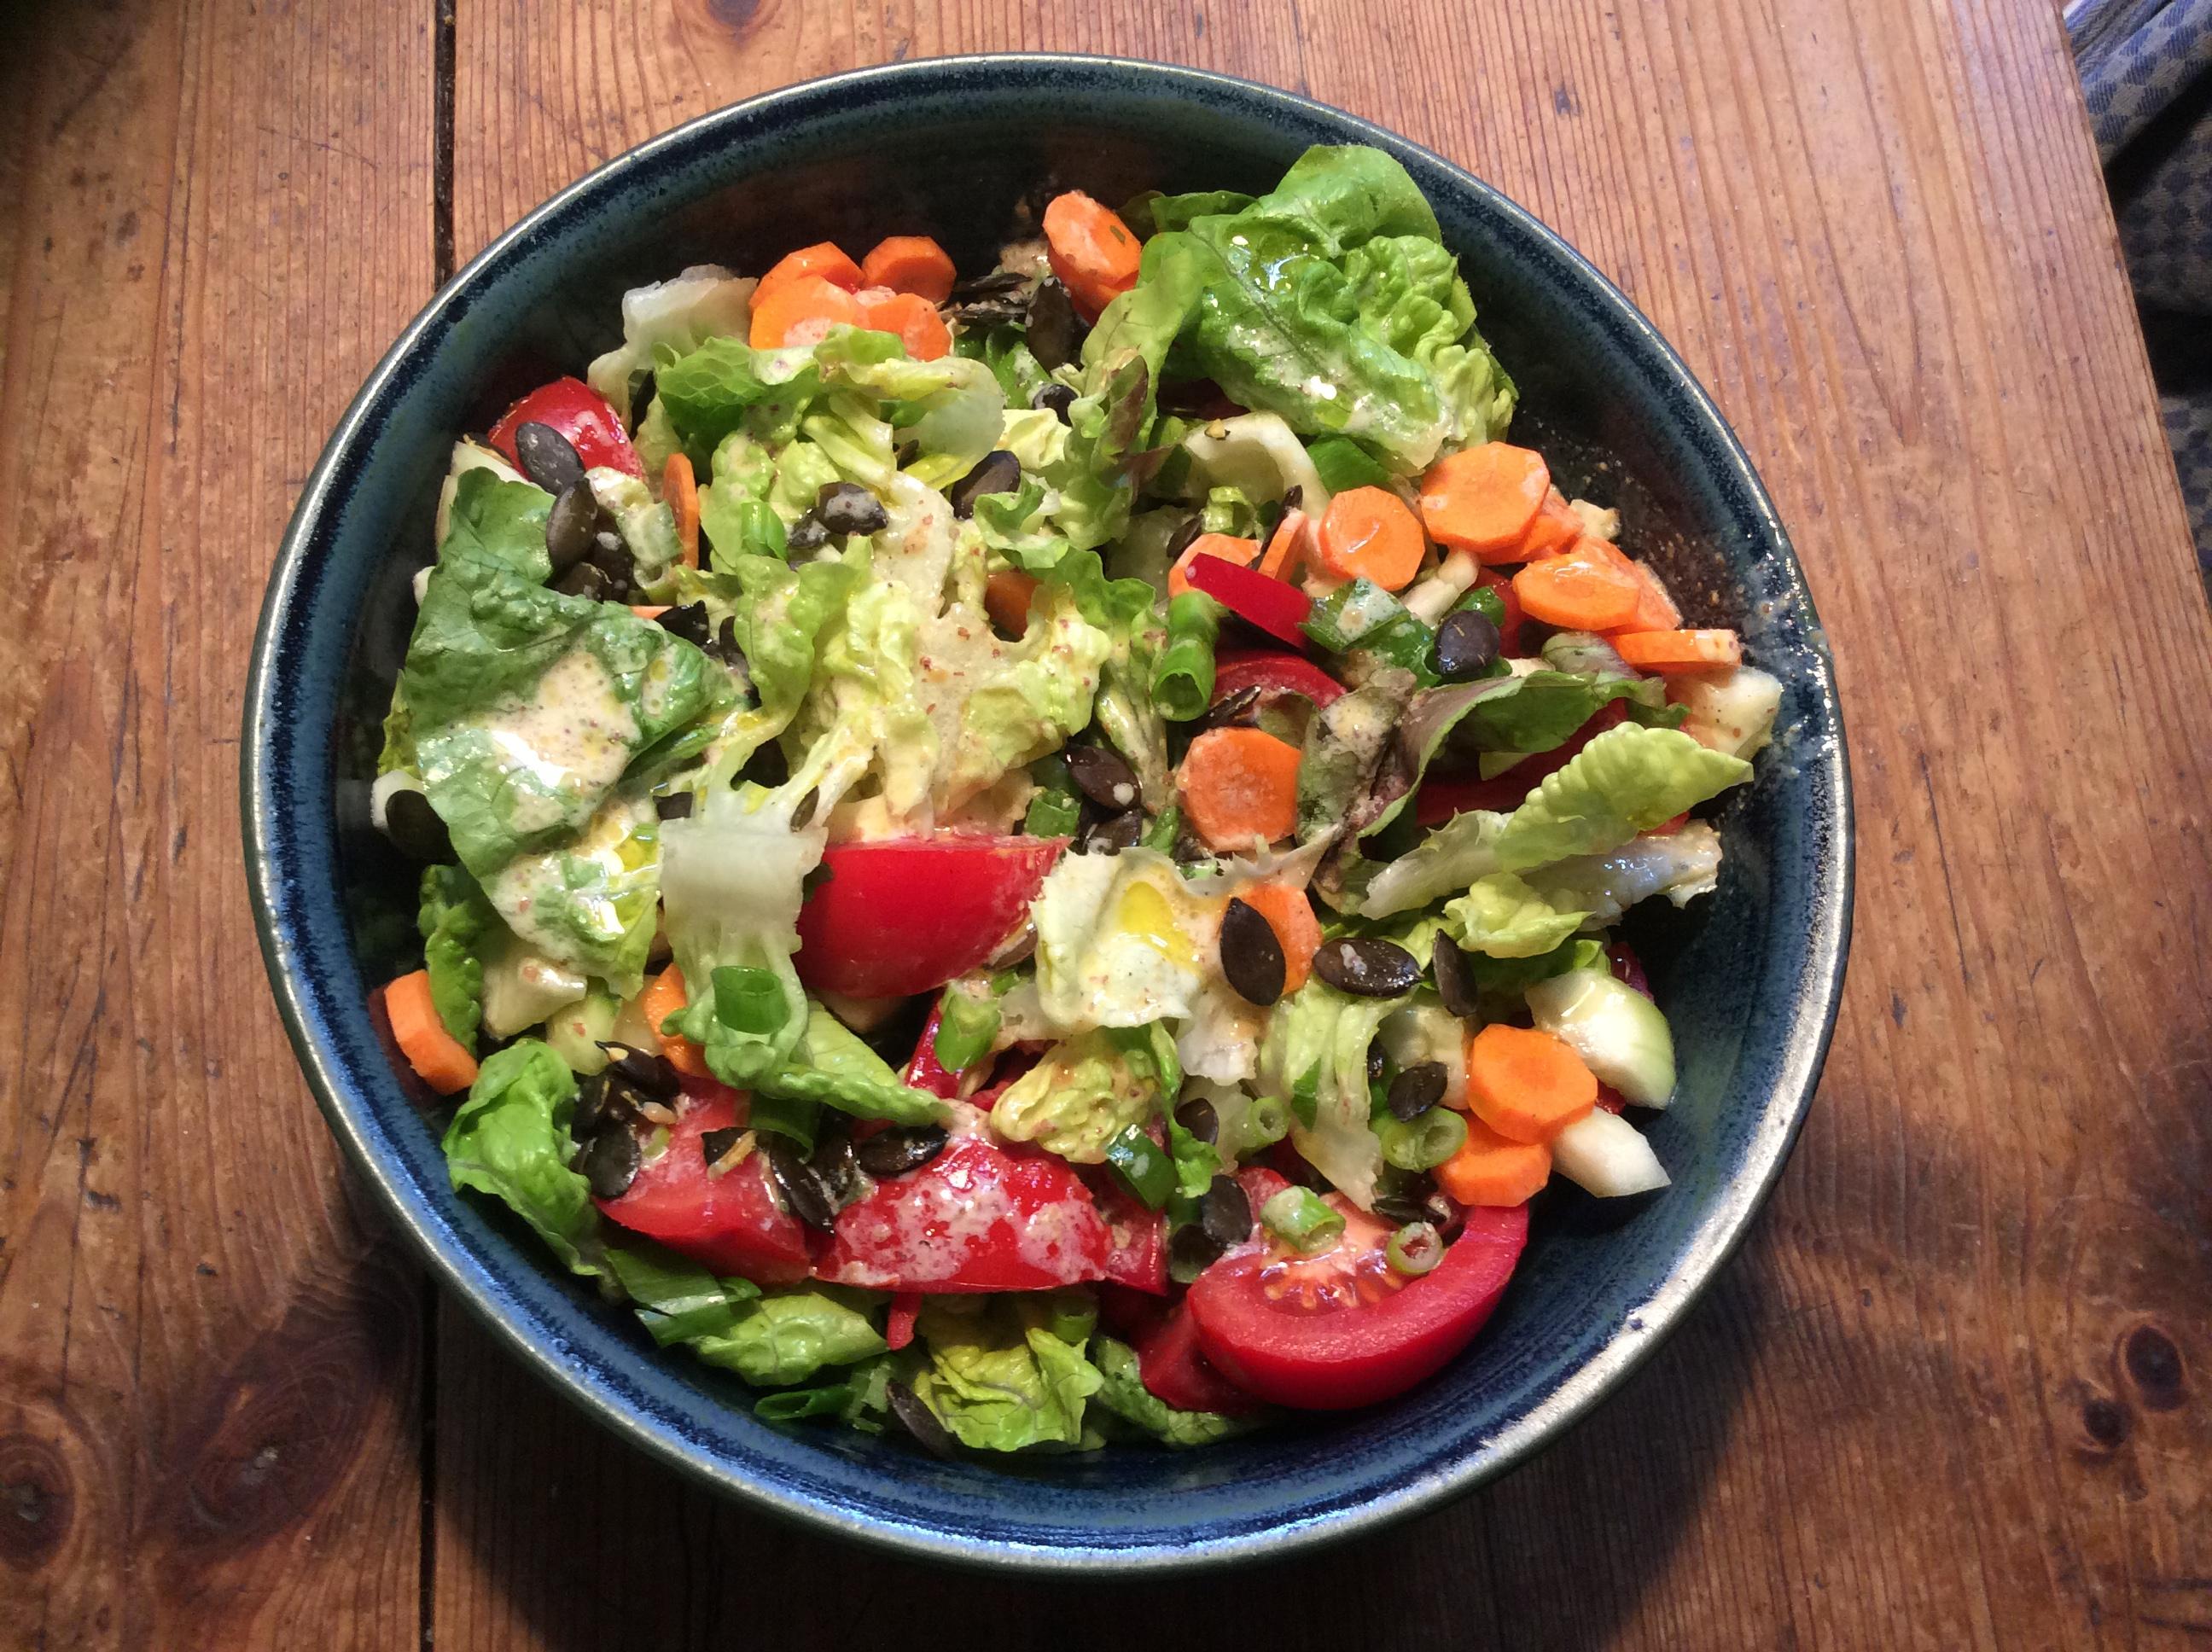 Marinierter Hering,gemischter Salat,Kartoffeln - 7.10.15   (1d)